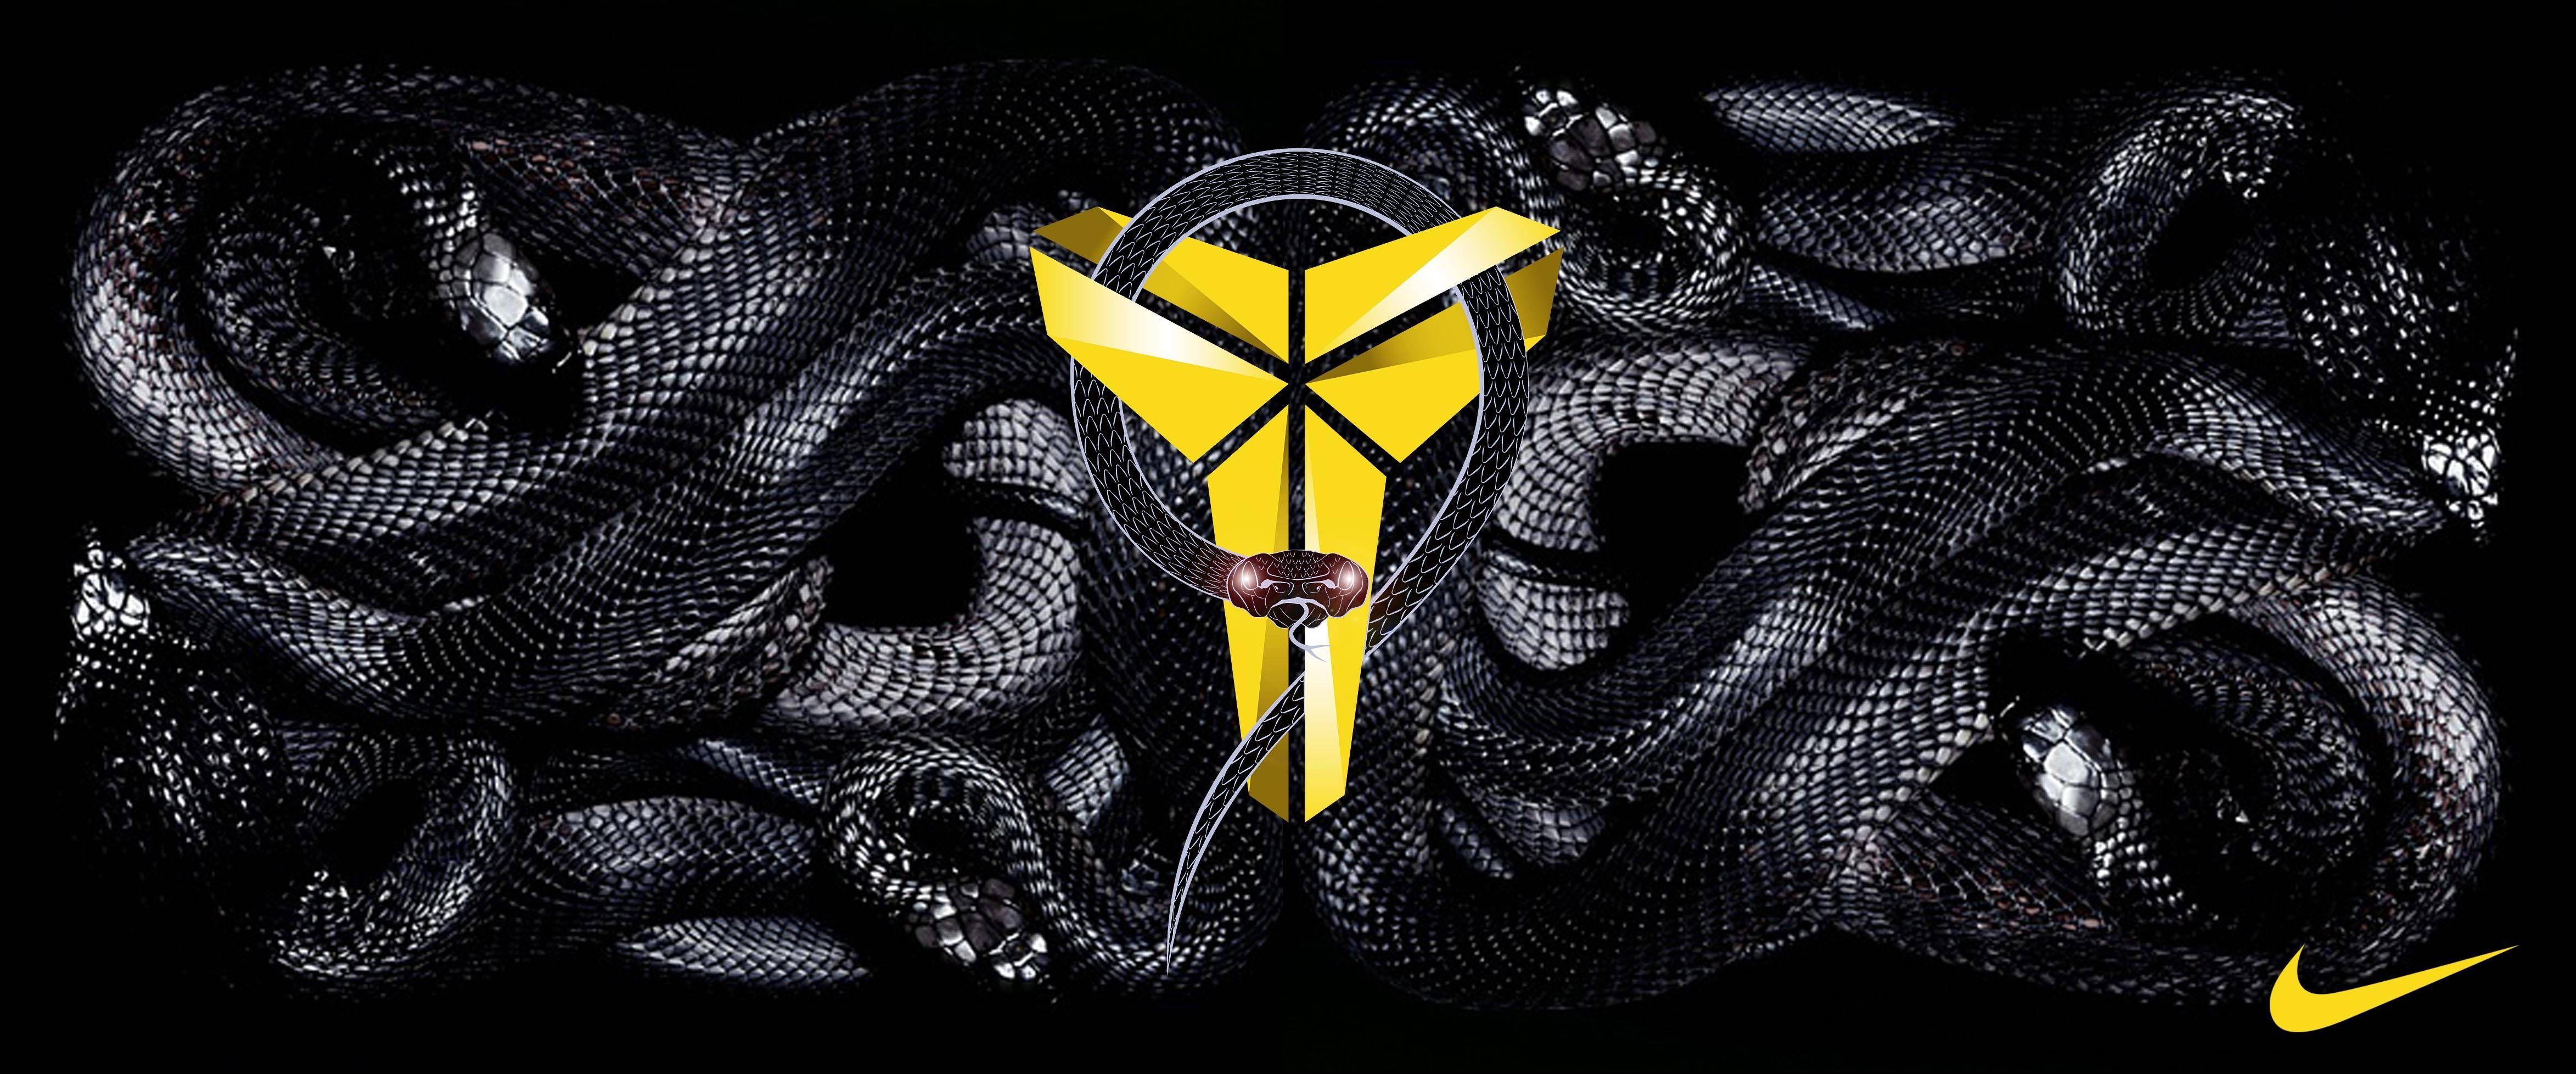 Black Mamba Wallpapers Kobe Bryant Wallpaper Lakers Kobe Bryant